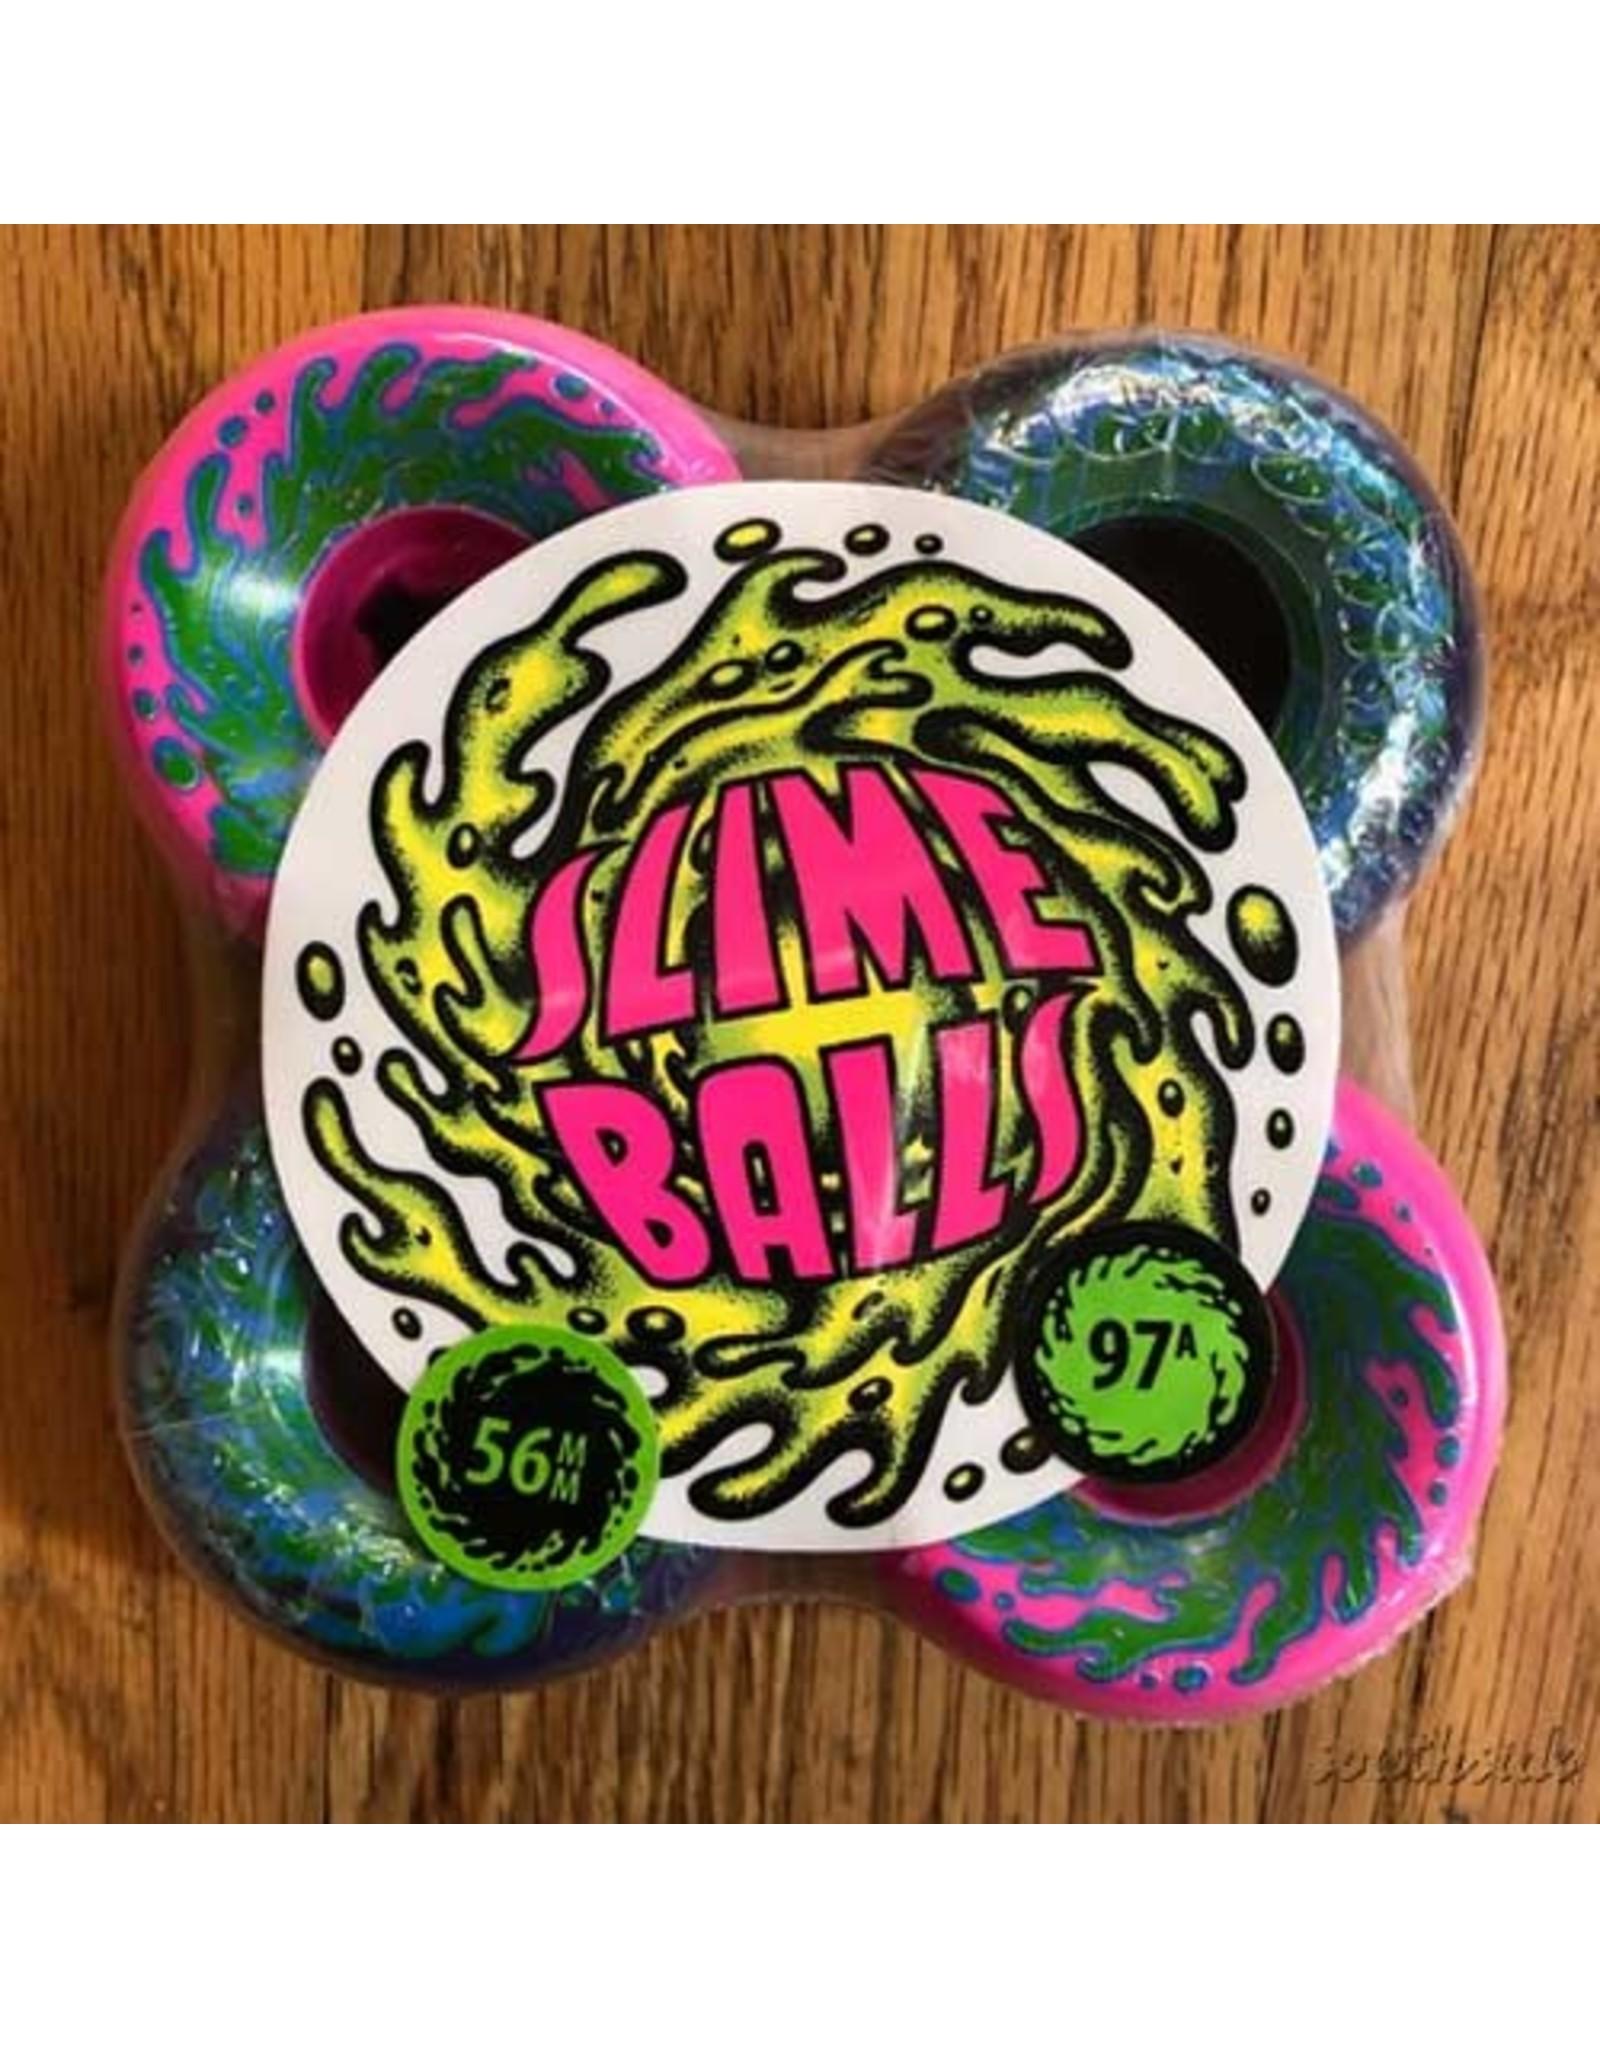 Slime Balls Slime Balls Double Take Vomit Mini 56mm97A Pink Black Half and Half